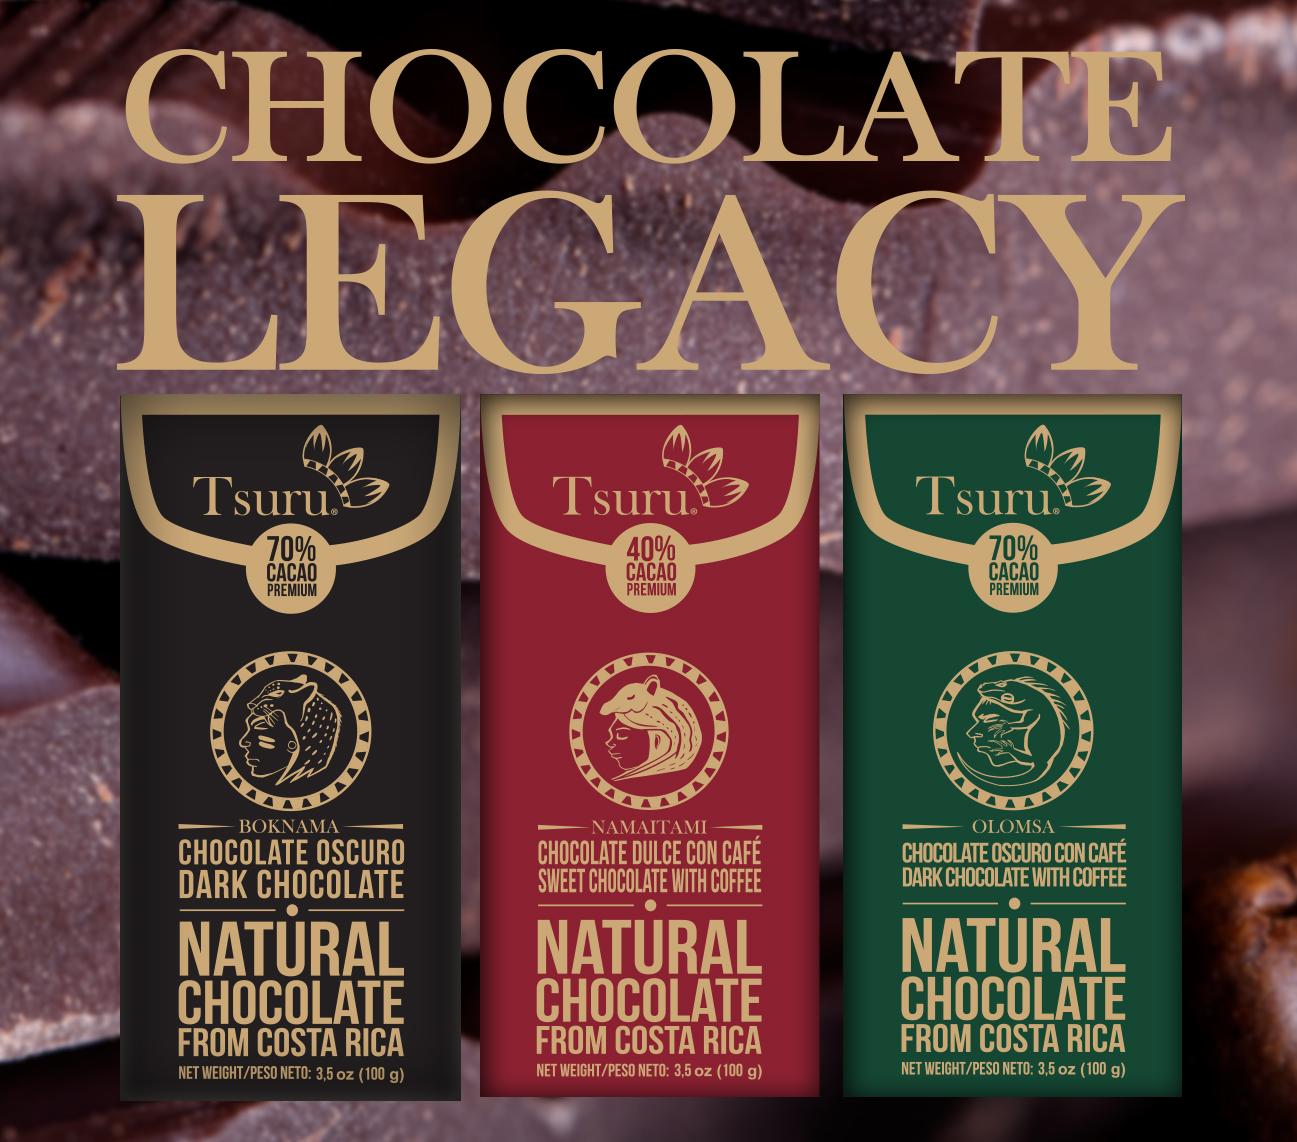 chocolate legacy 3 presentaciones.jpg